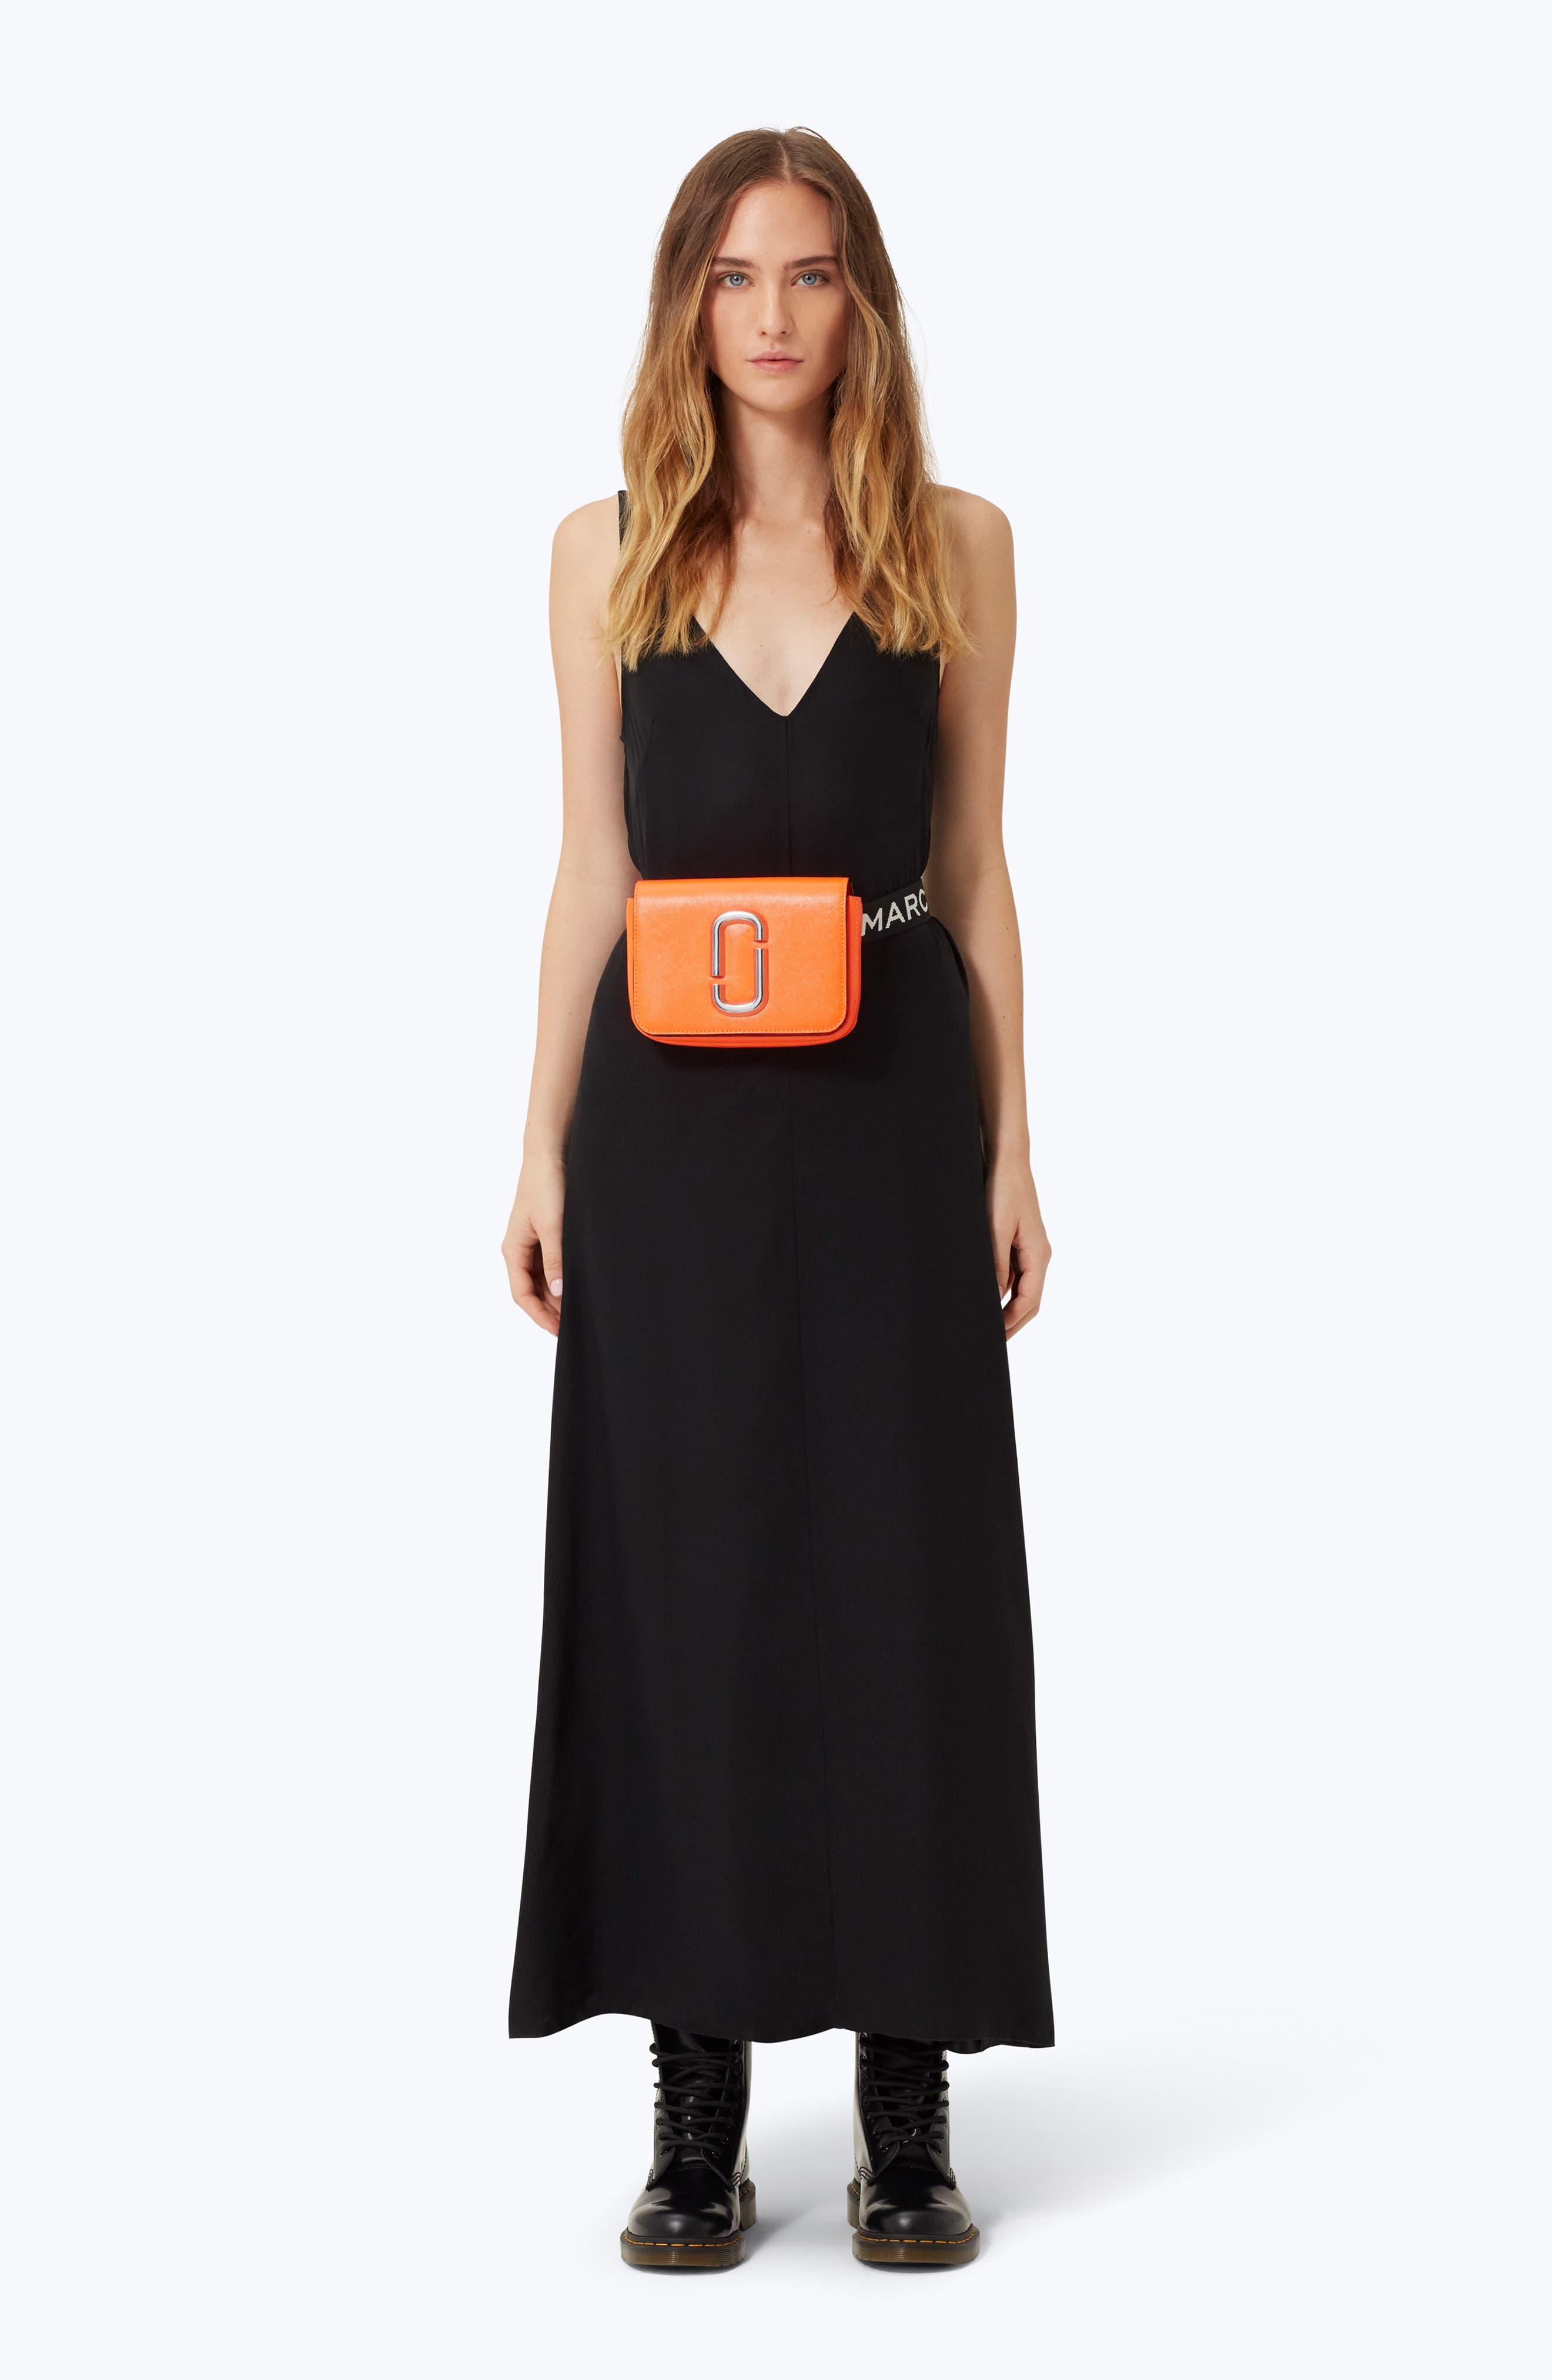 Hip Shot Convertible Crossbody Bag - Orange in Black